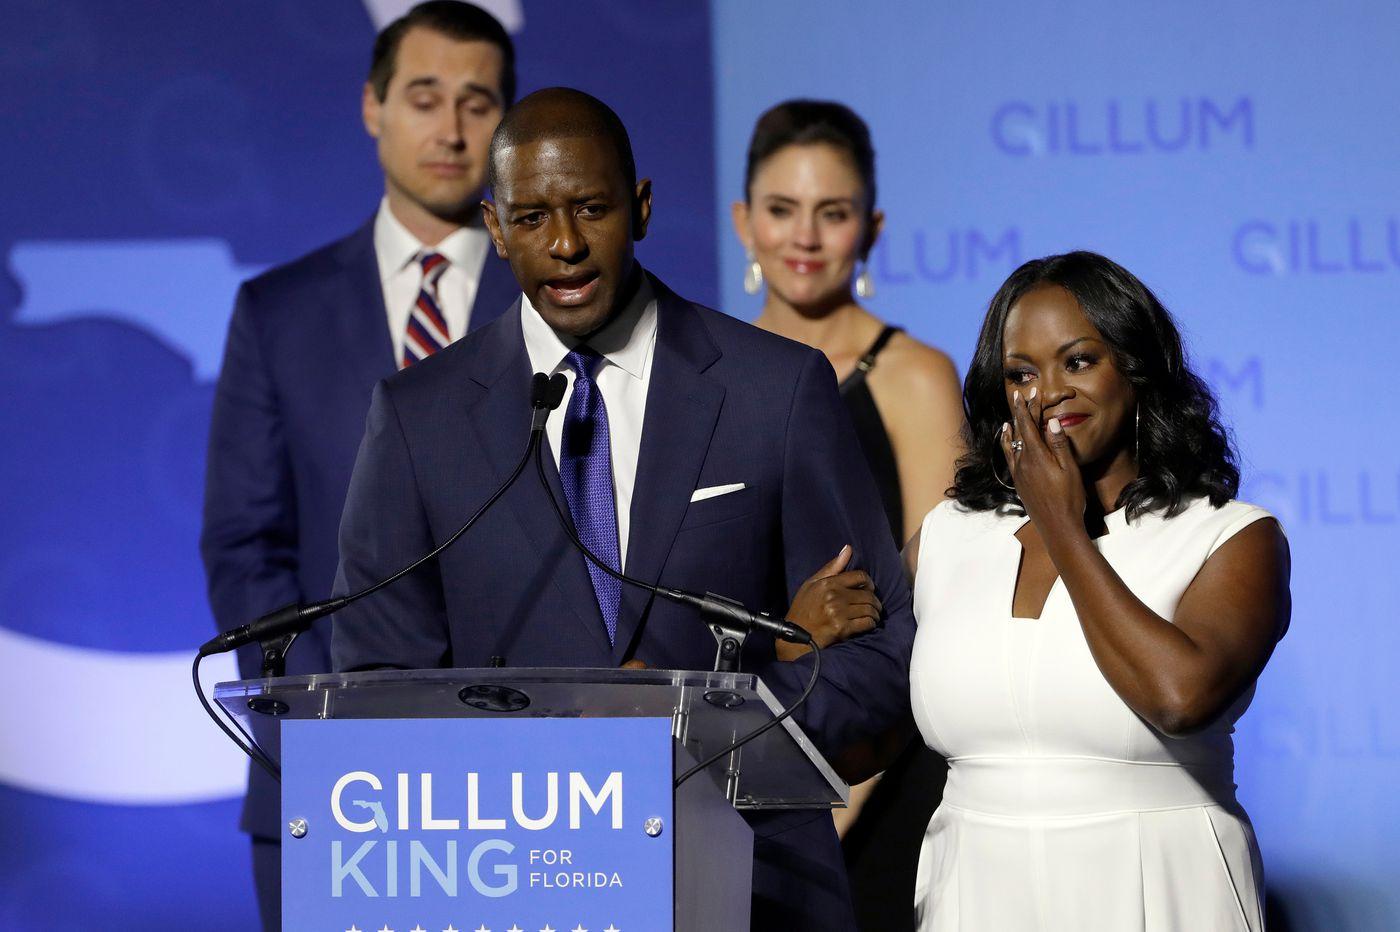 Possible recounts loom in tight Florida gov, Senate contests